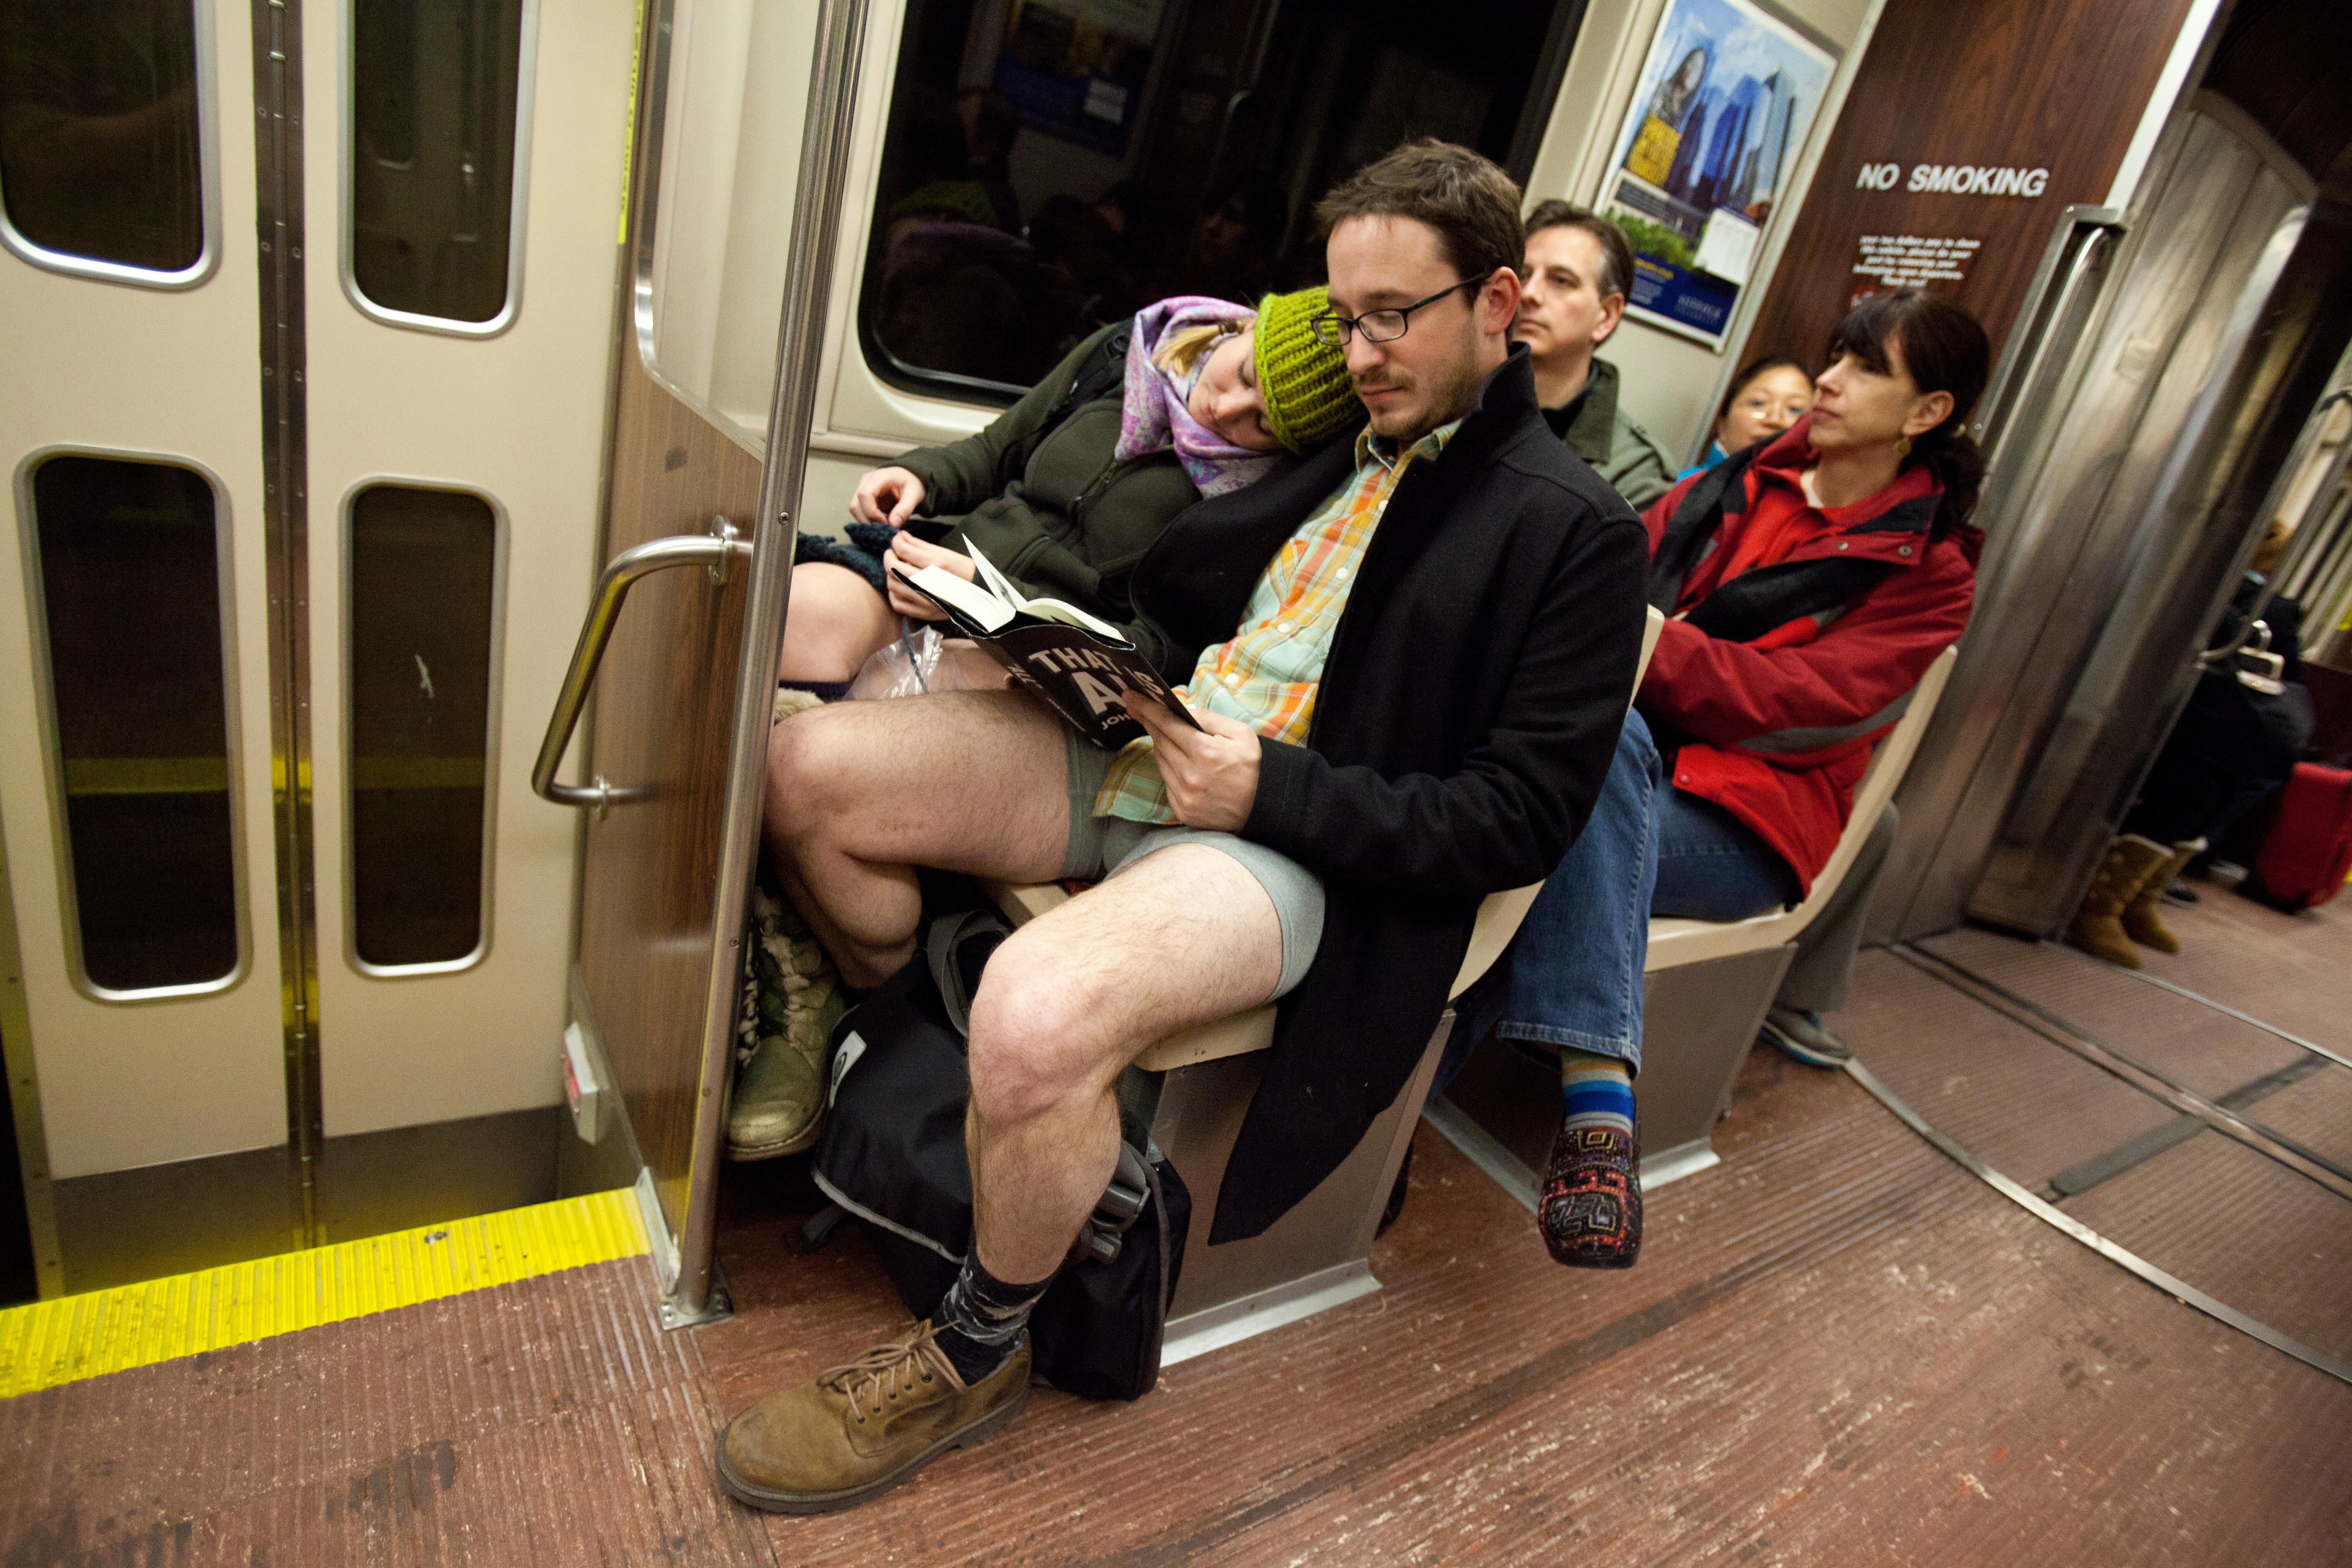 No Pants Subway Ride Boston 2012给自己一个不穿裤子不羞羞的理由